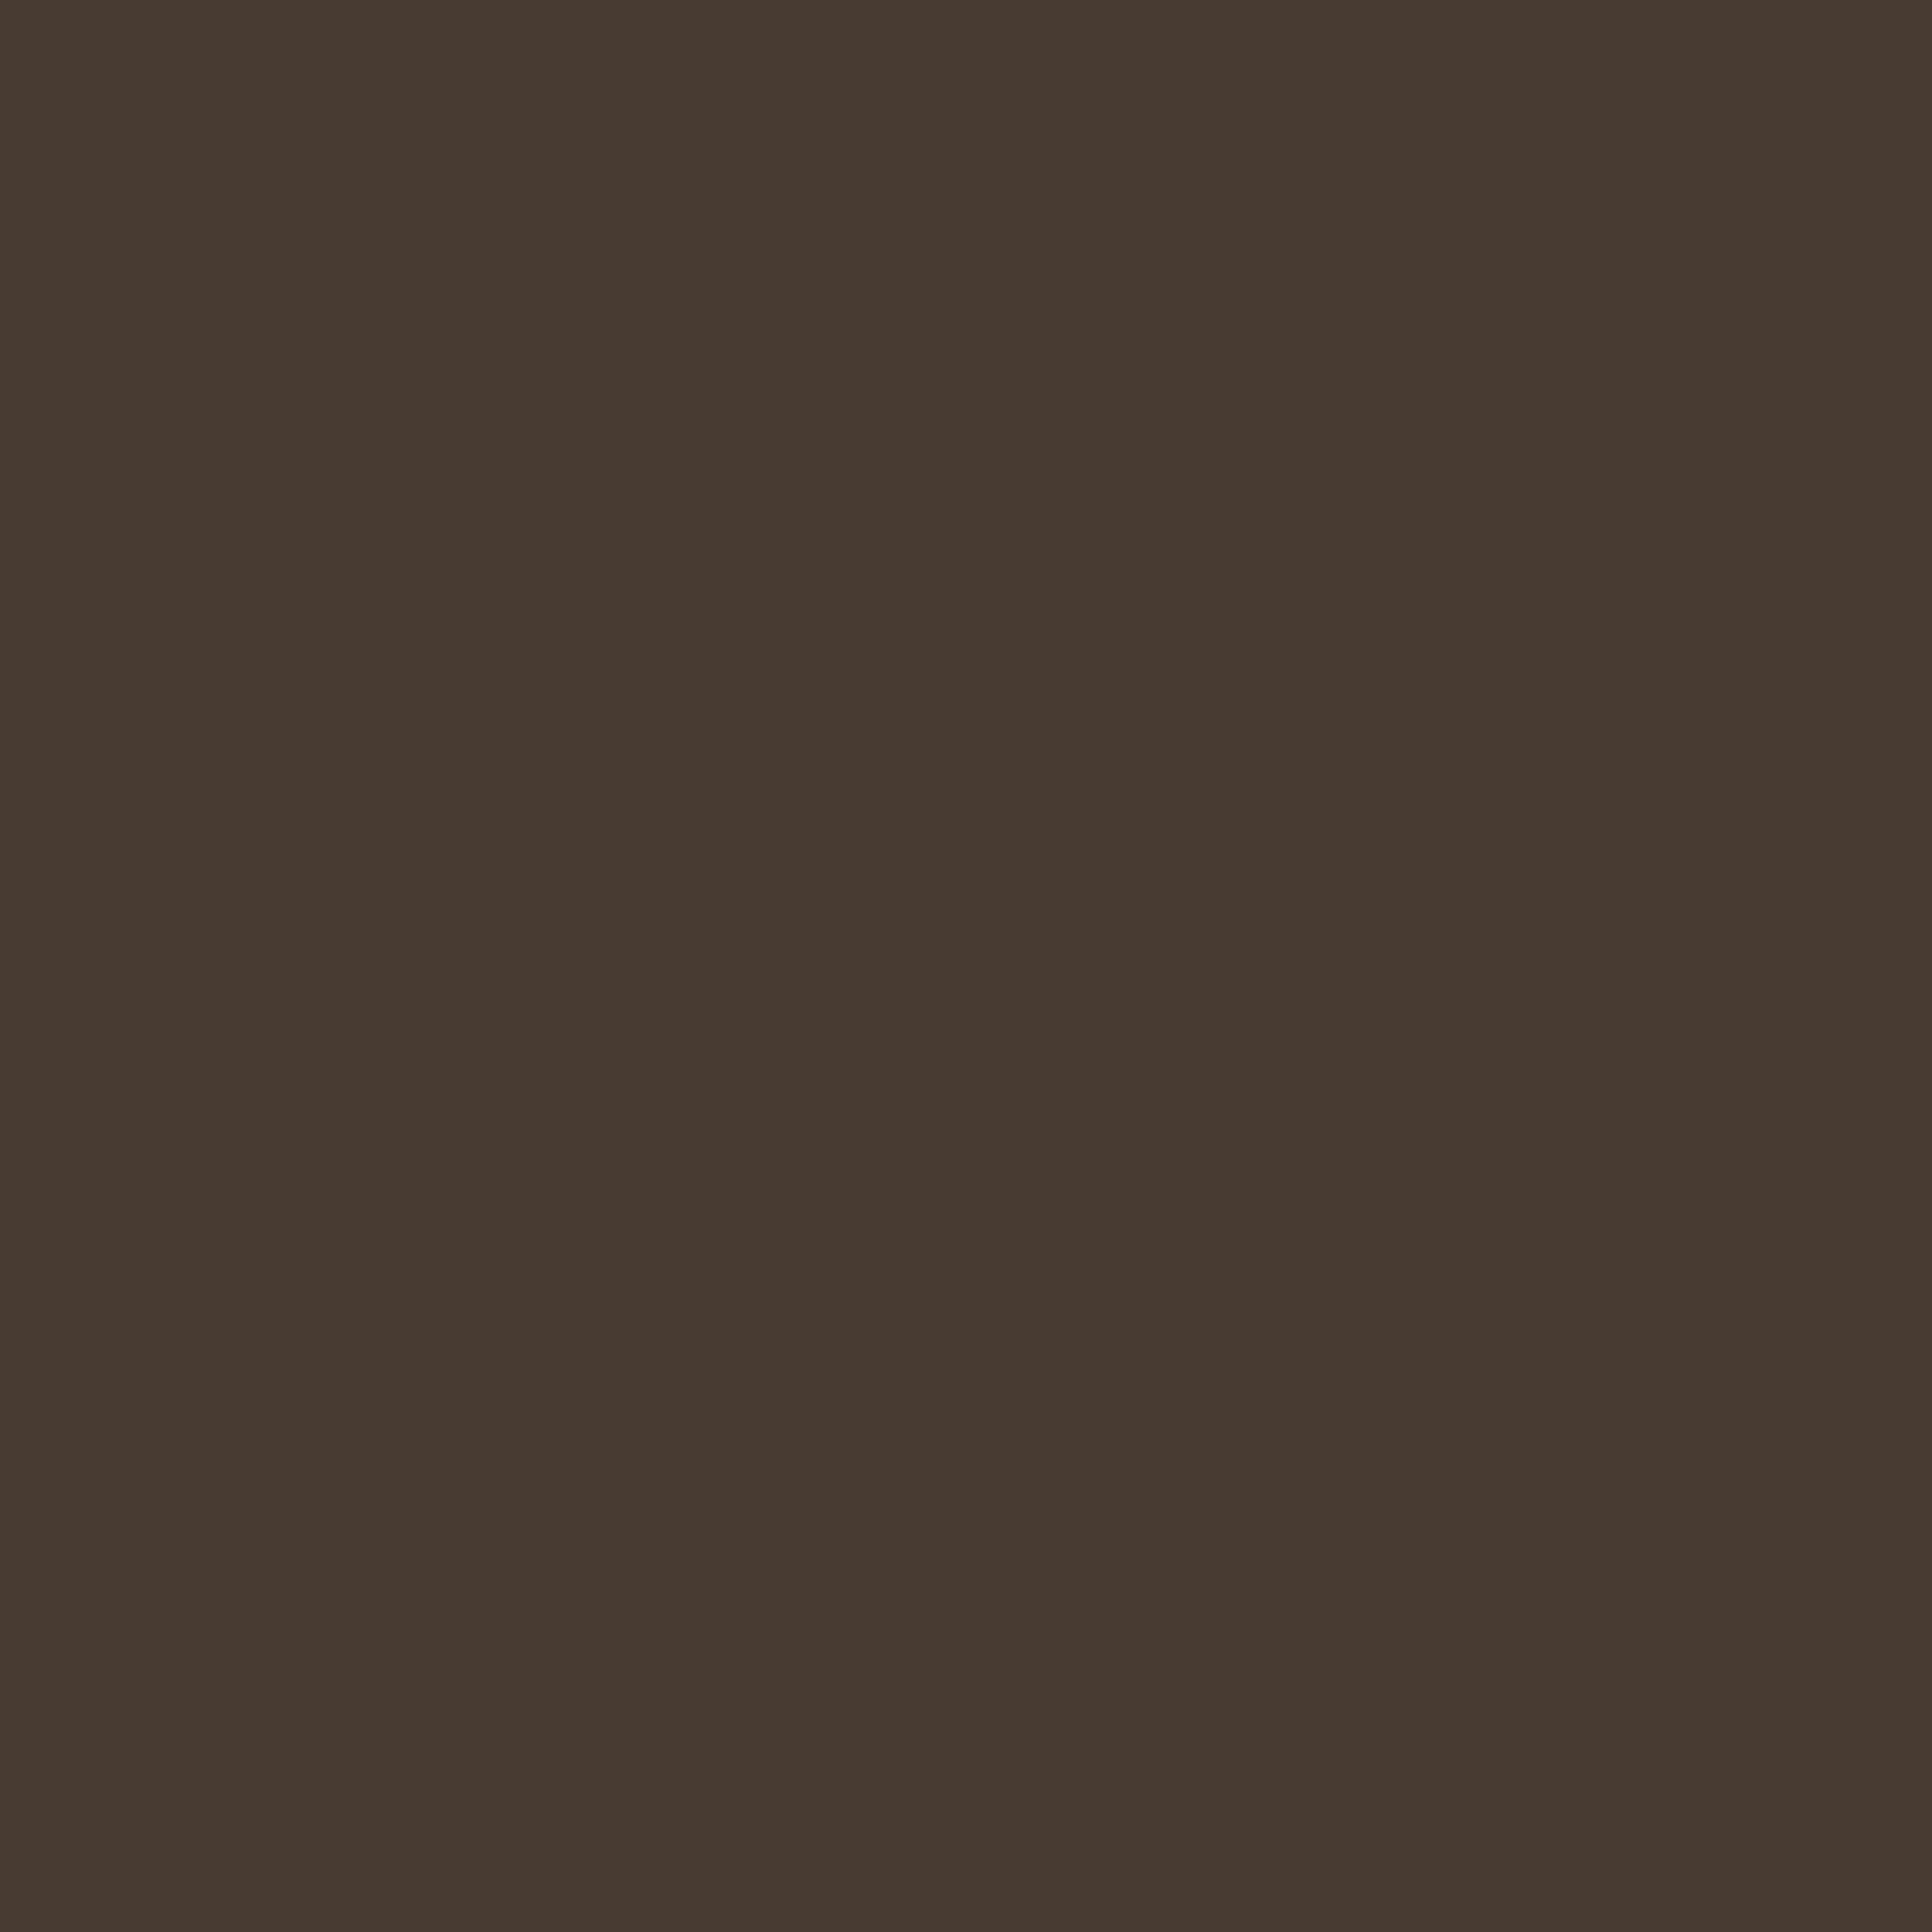 2732x2732 Dark Lava Solid Color Background